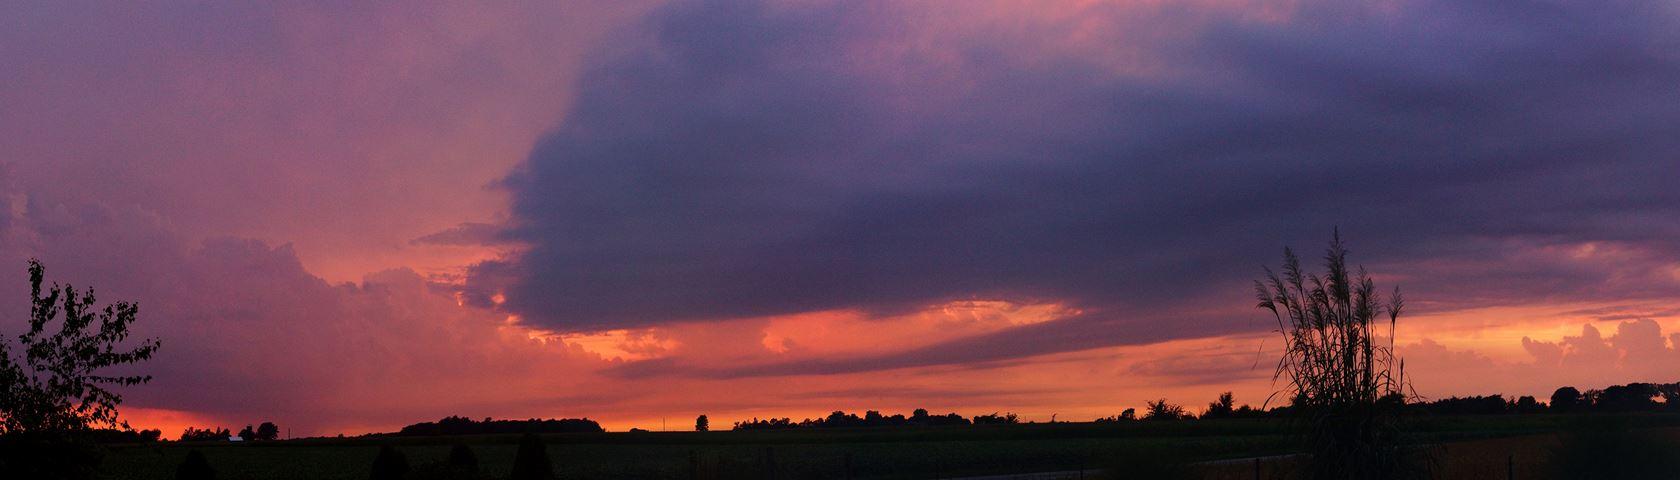 Sunset Lightning Storm